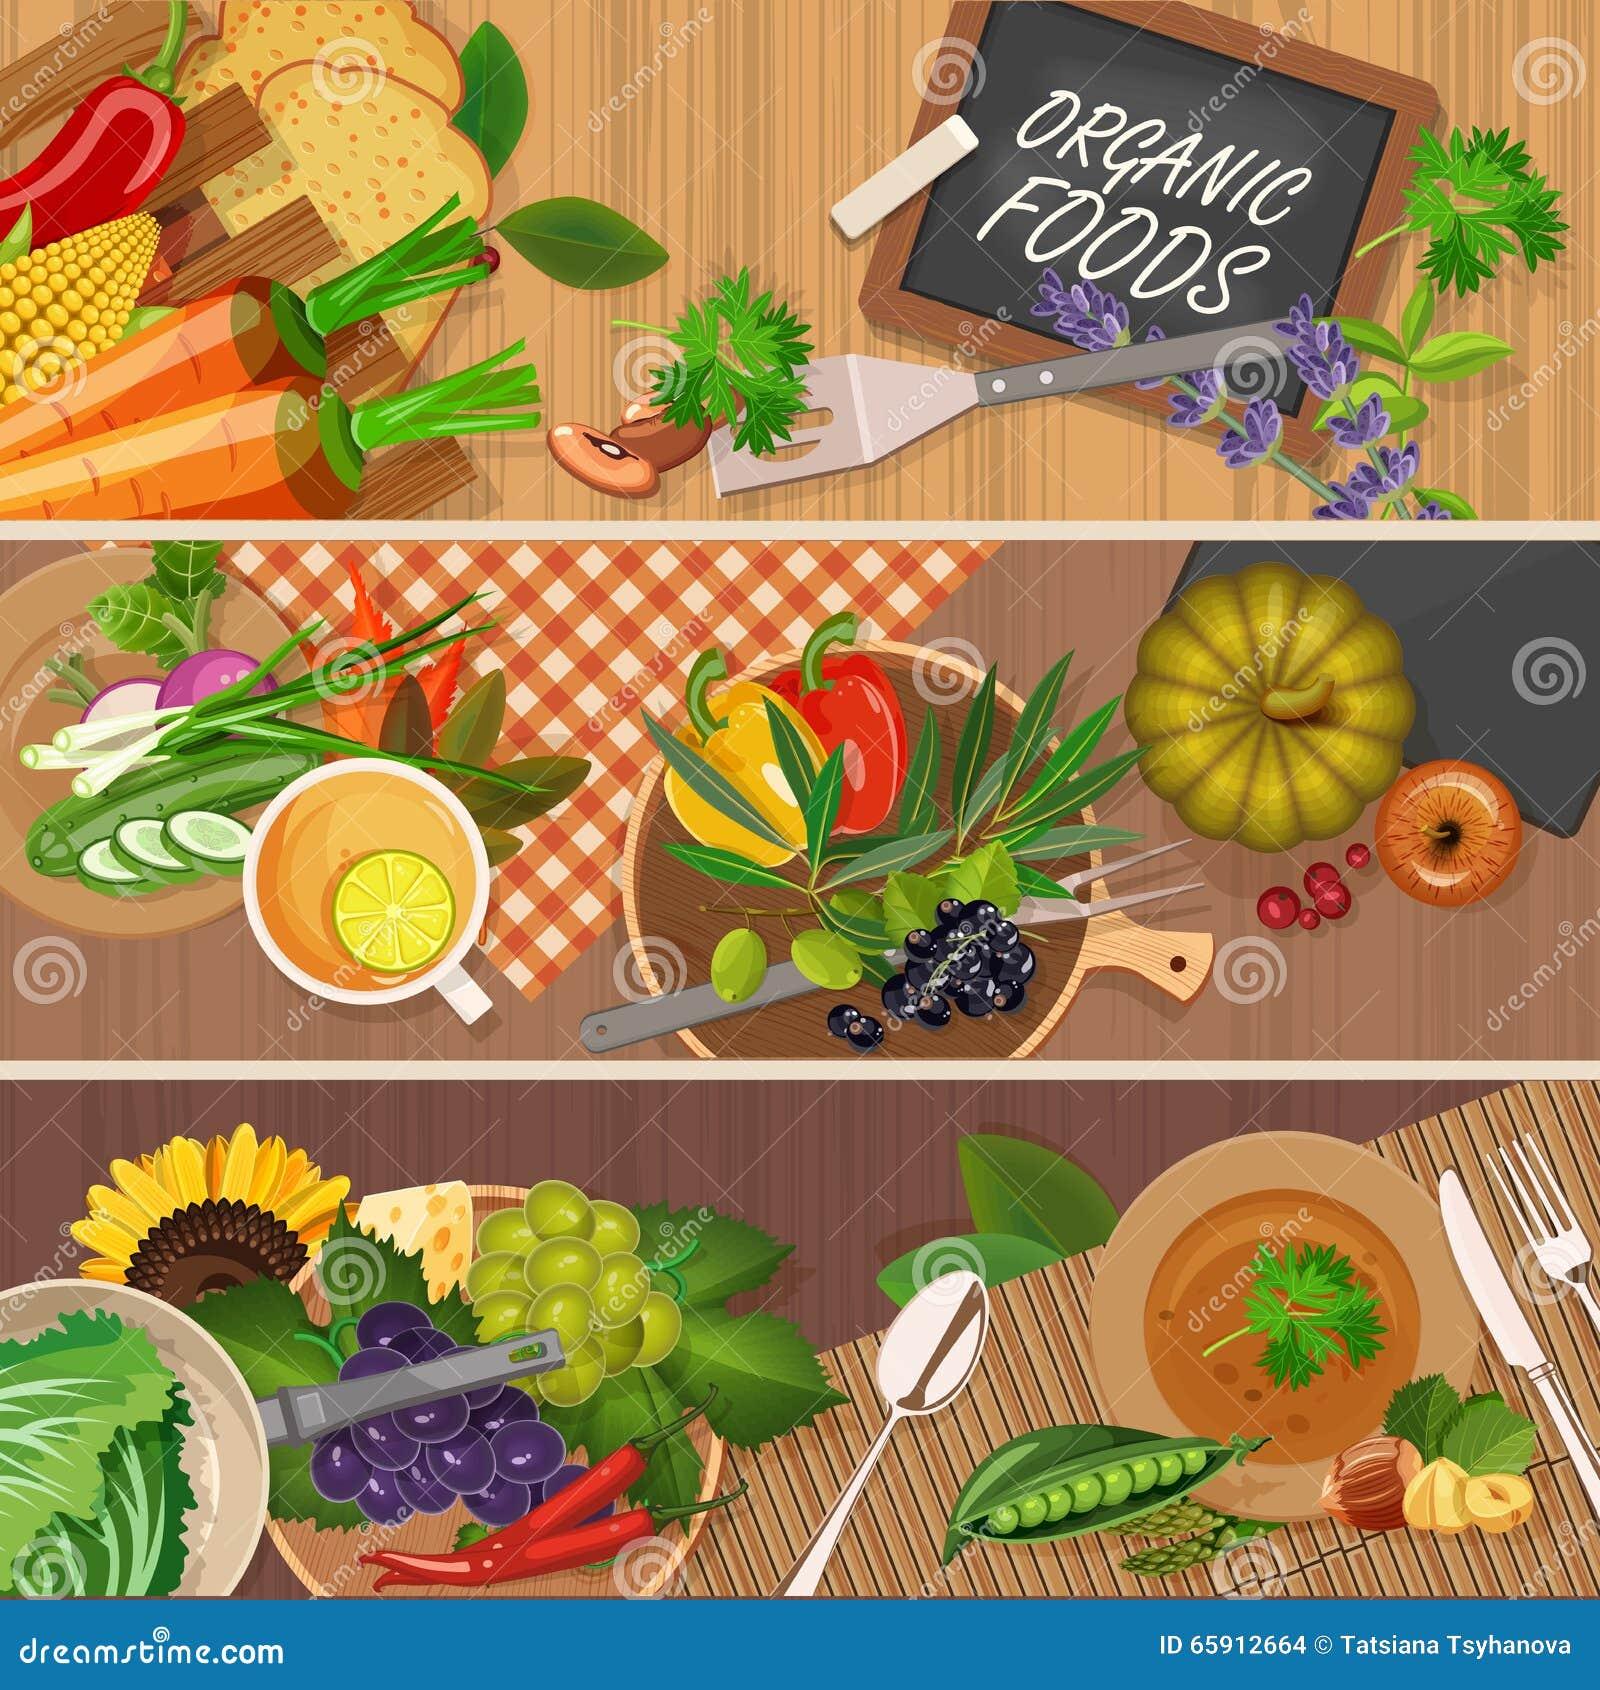 Vector illustration of vitamin groups. Fruit and vegetables set.